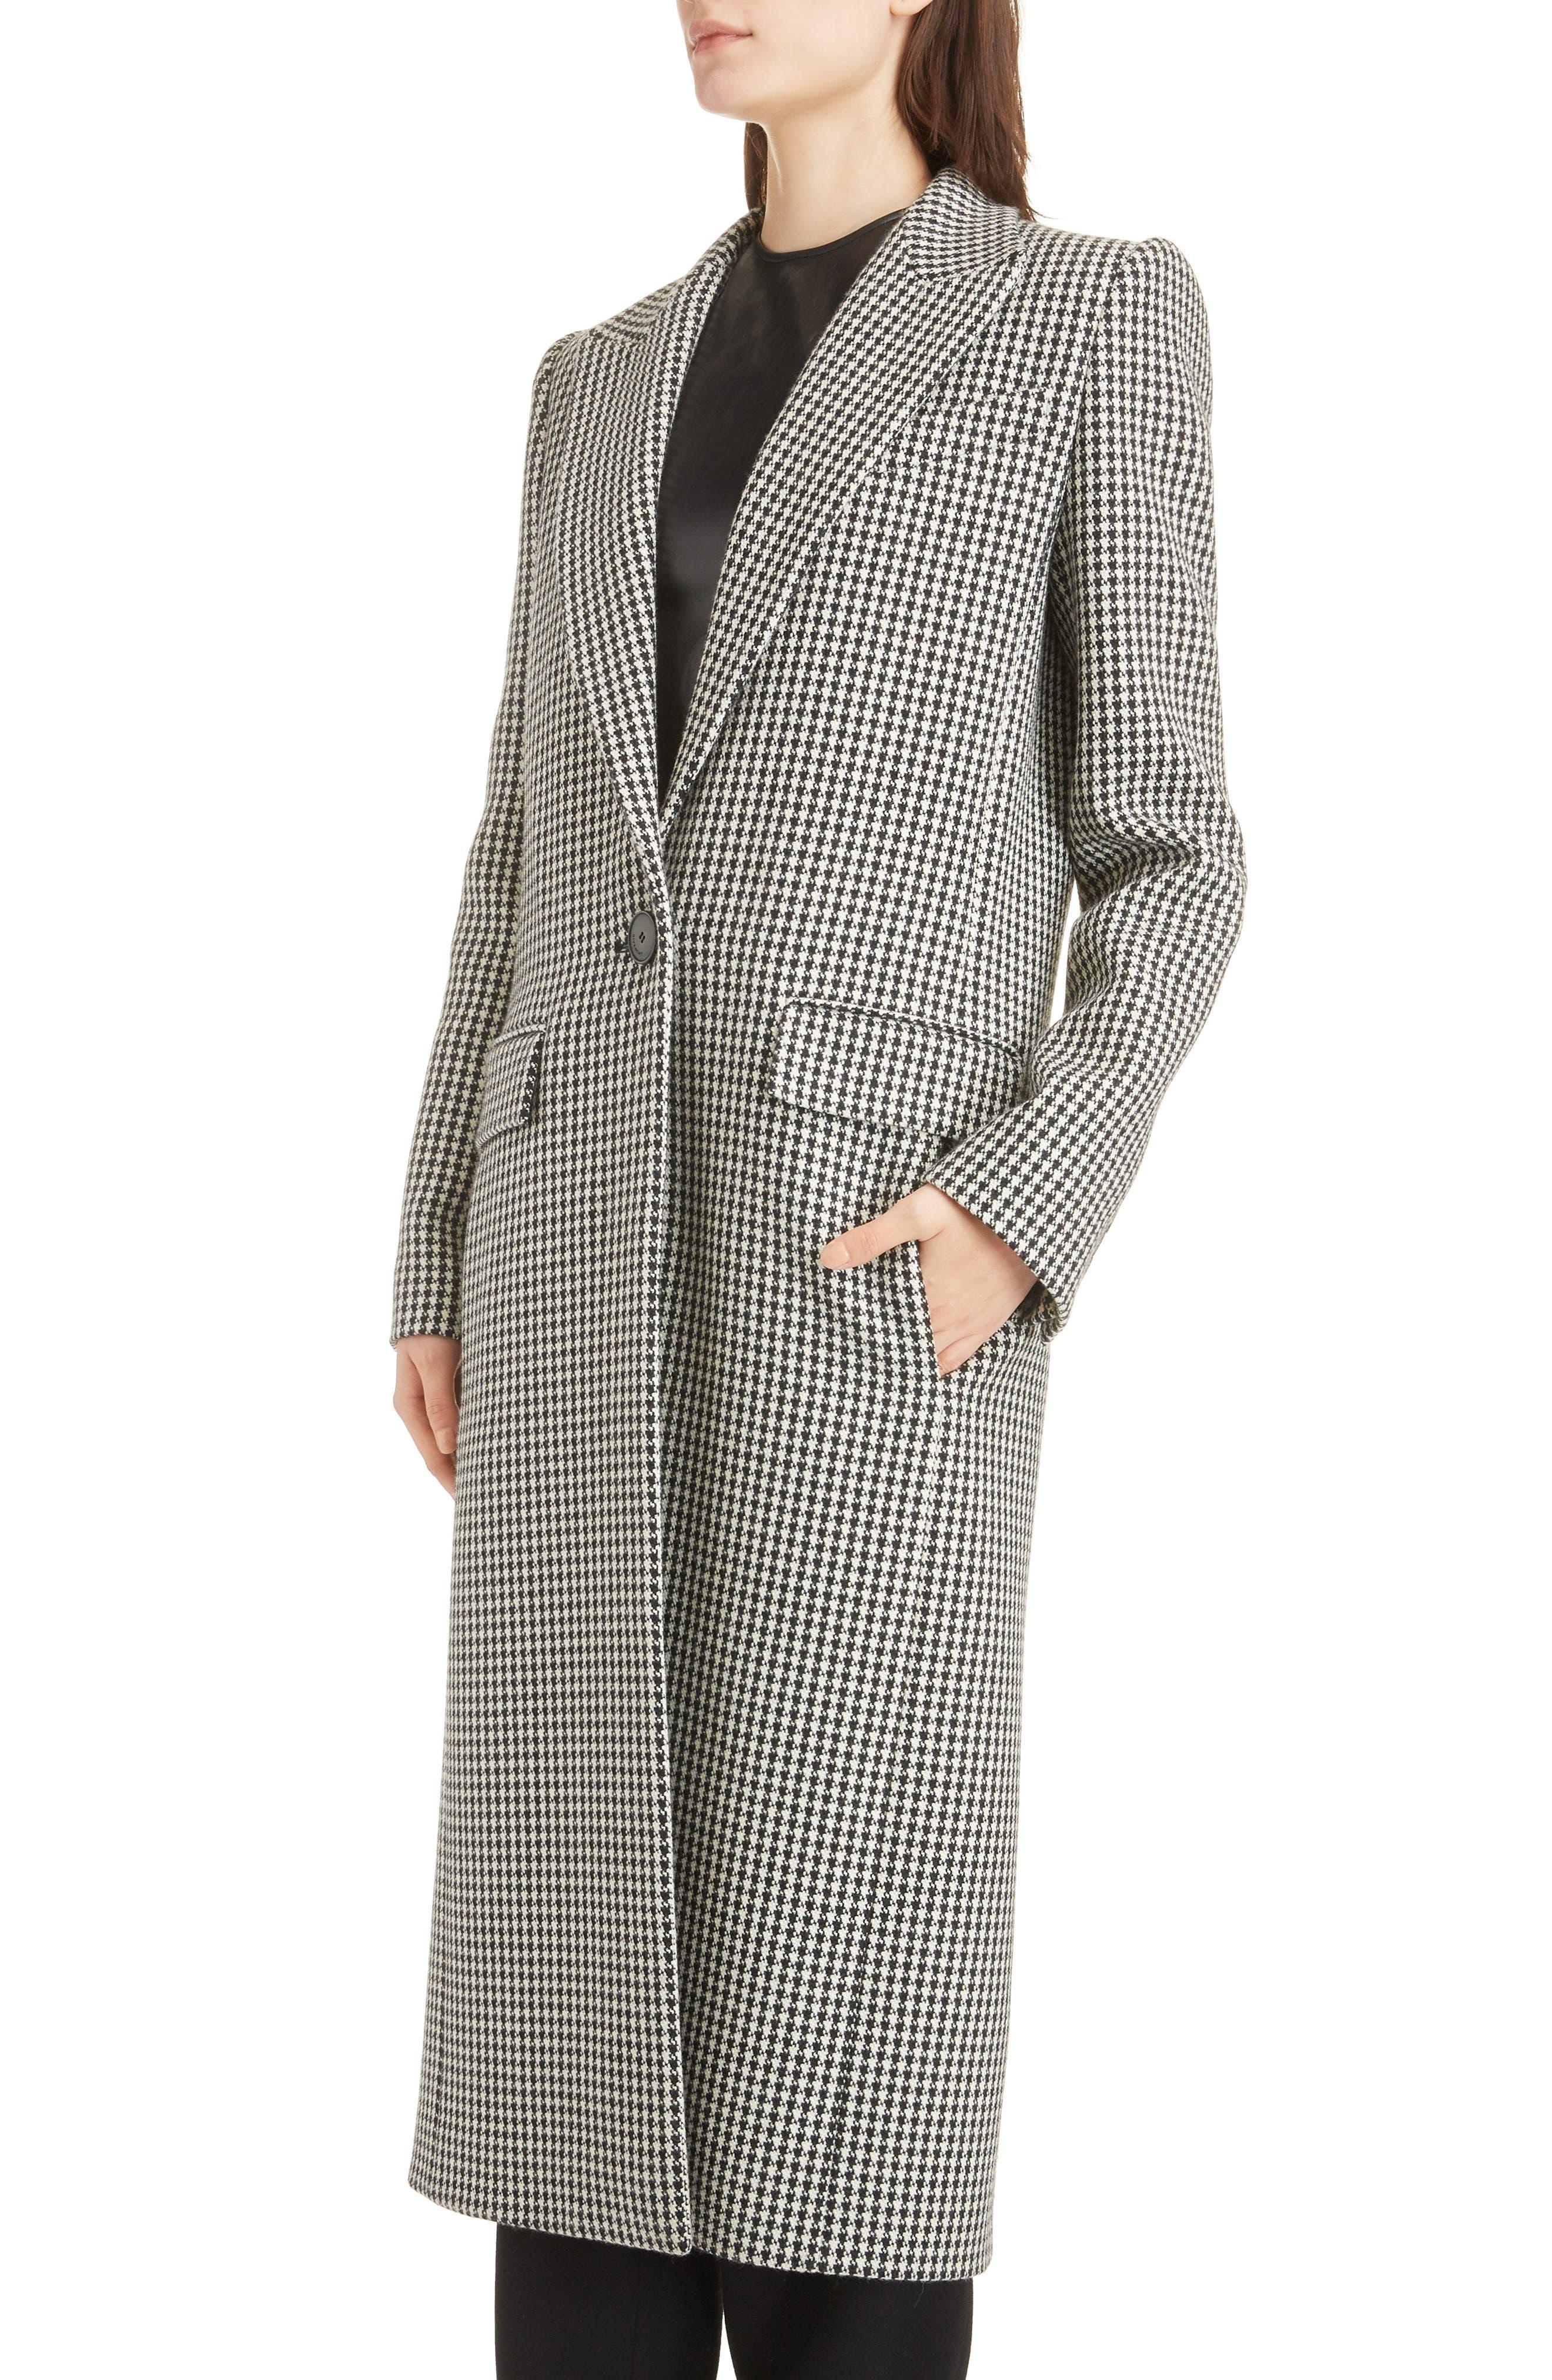 Houndstooth Wool Coat,                             Alternate thumbnail 4, color,                             BLACK NATURAL